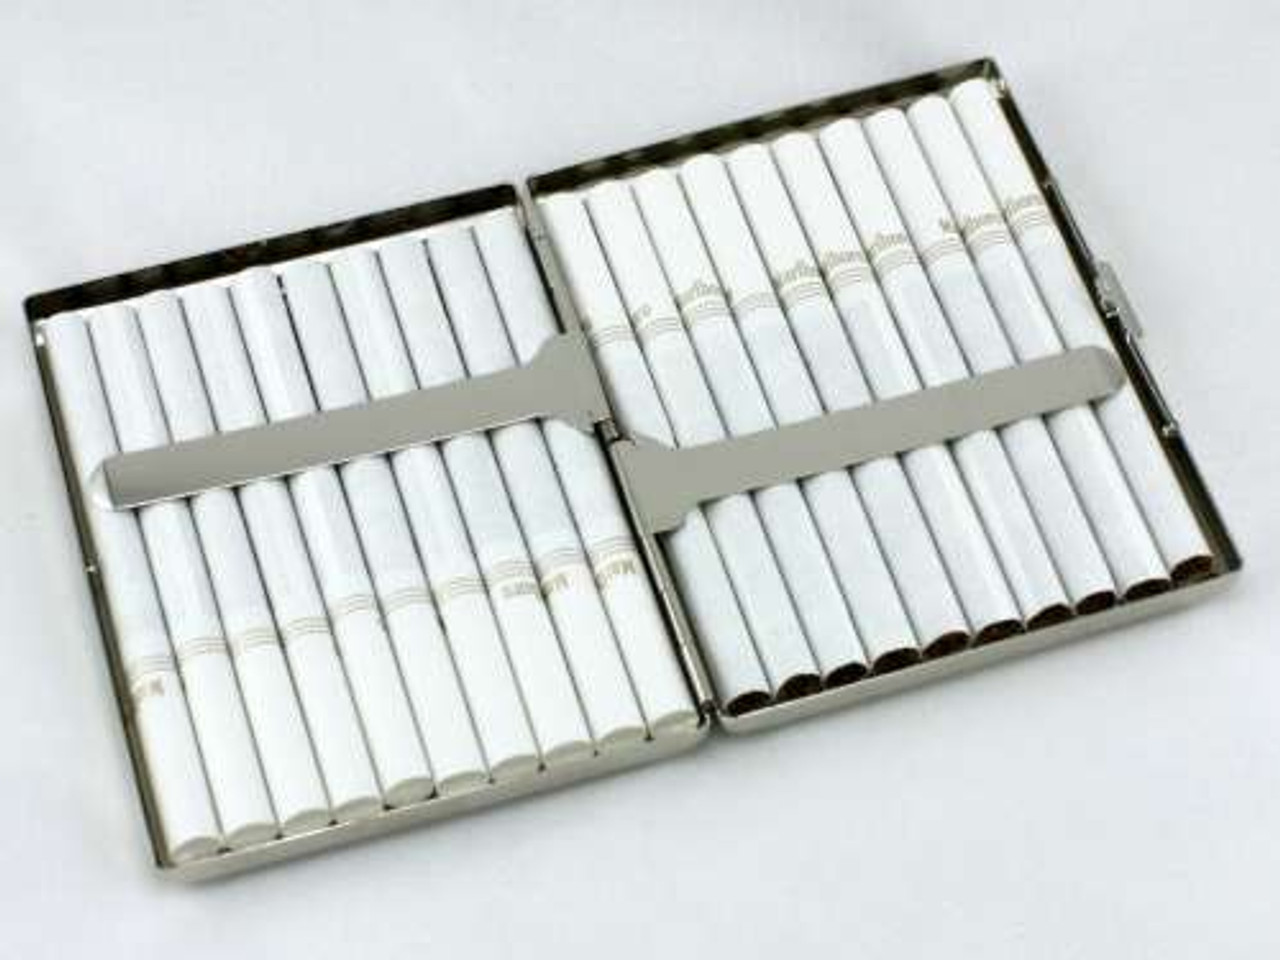 Ace of Spades Cigarette Case